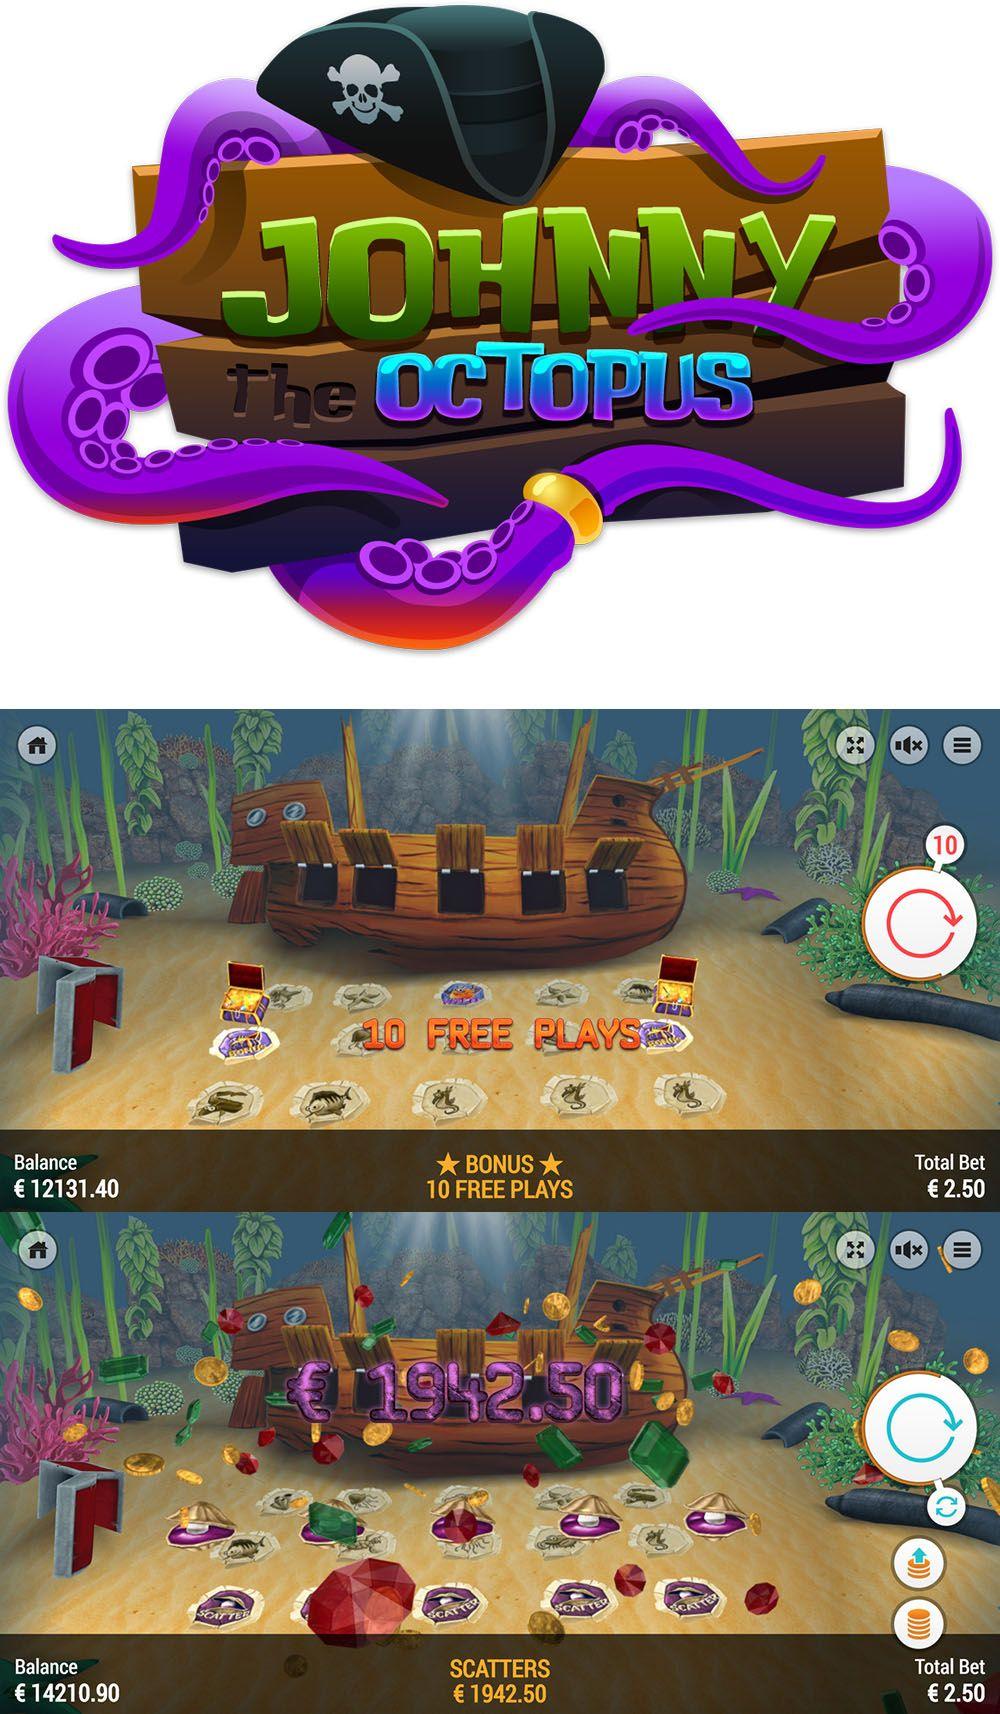 онлайн в покер на автоматах игры